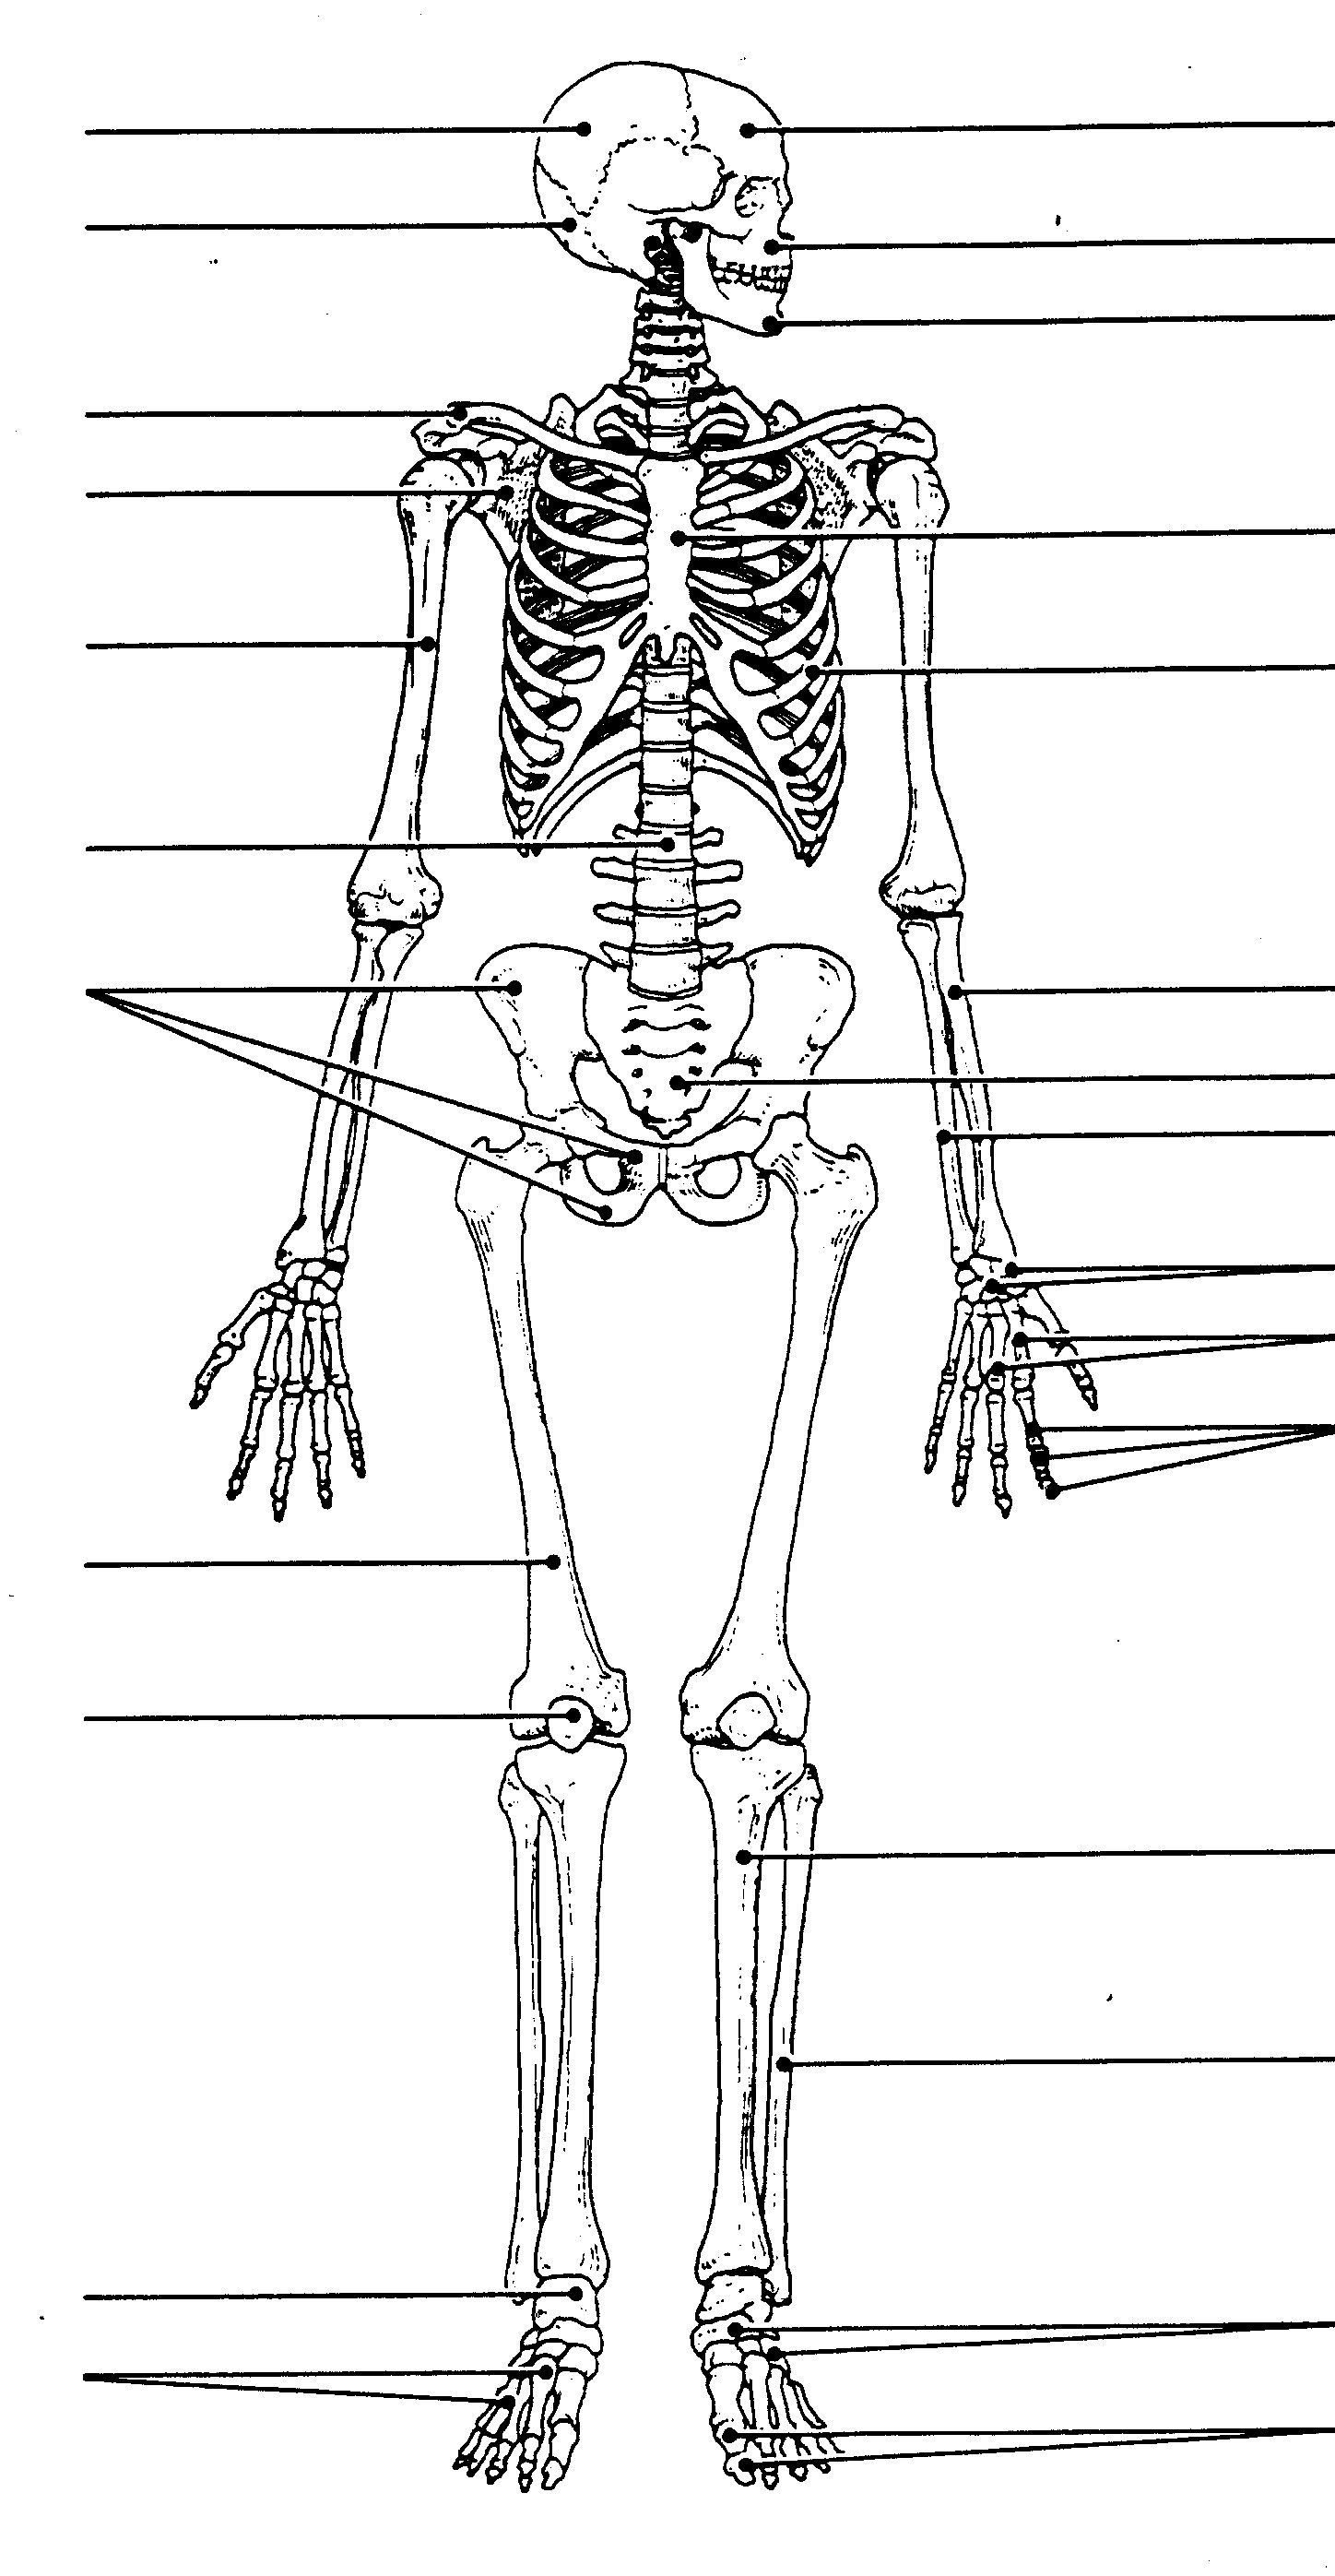 human skeleton diagram unlabeled human skeleton diagram unlabeled blank human skeleton diagram unlabeled human skeleton [ 1448 x 2793 Pixel ]